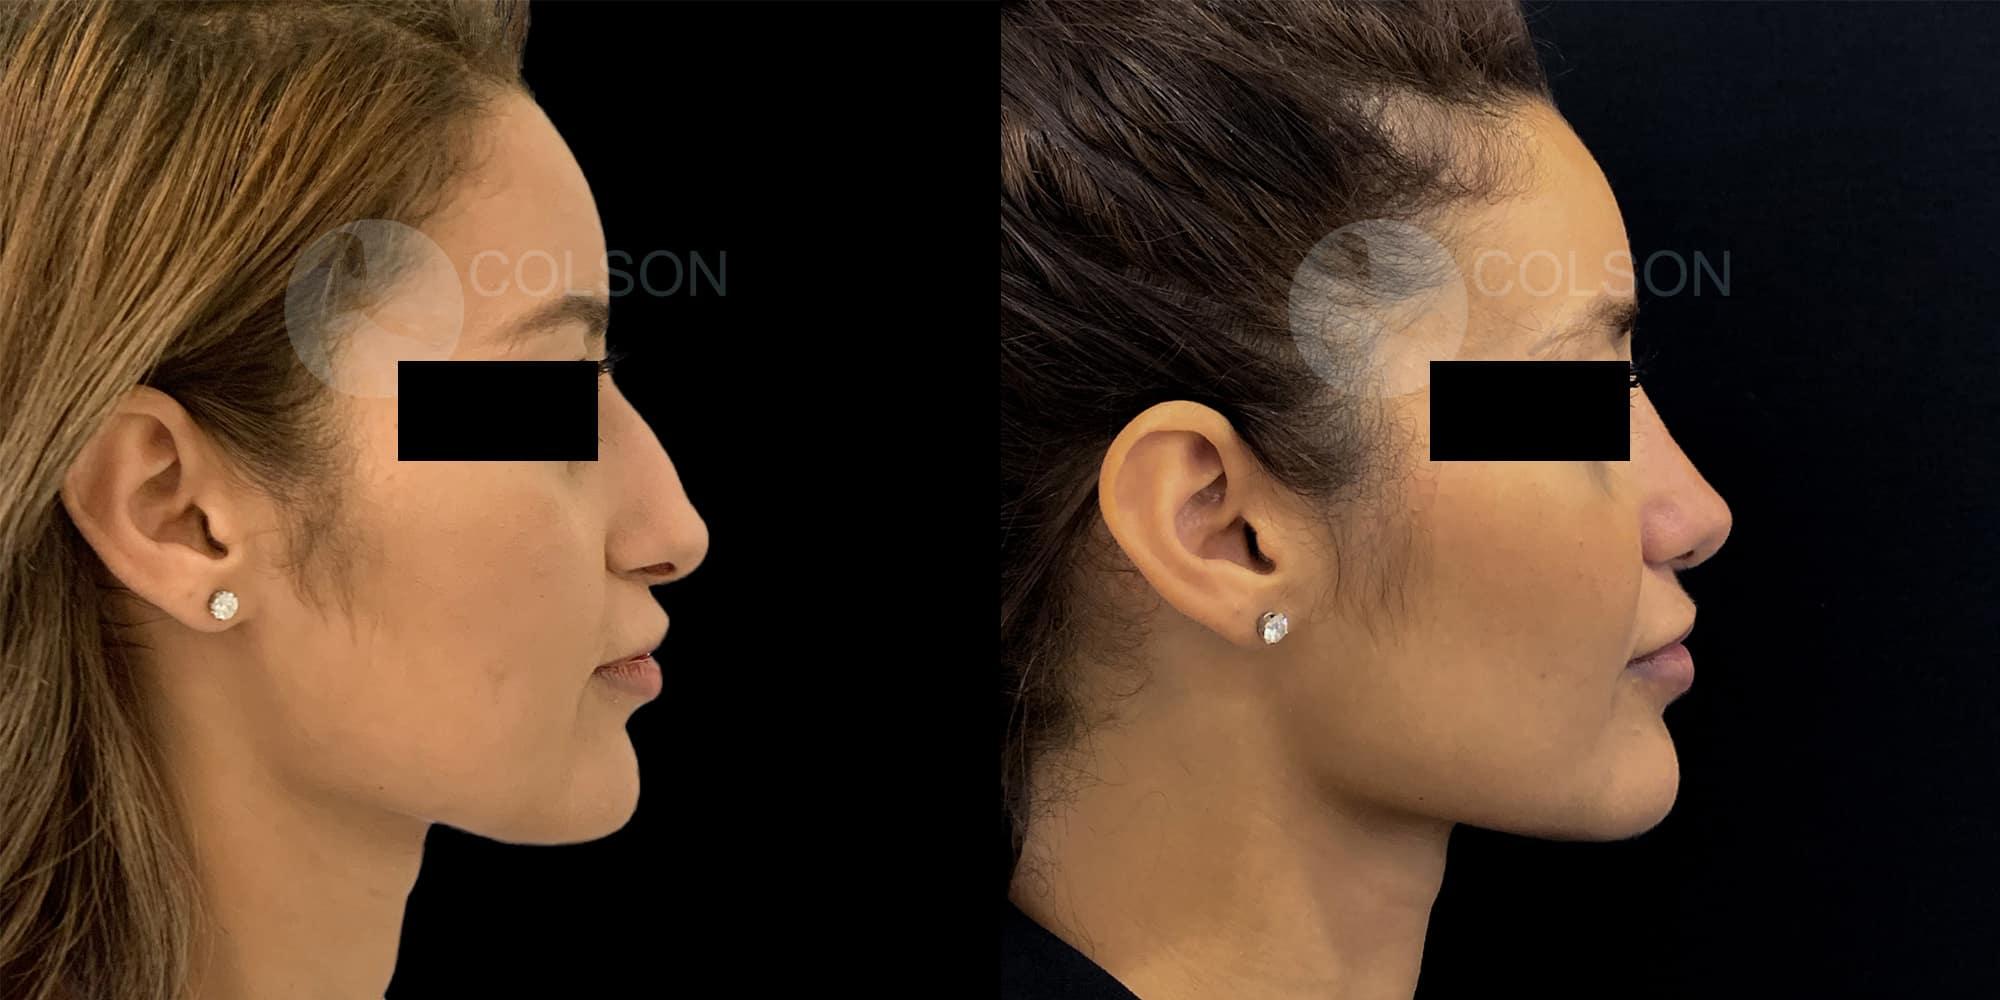 Dr Colson - Chirurgie visage - Rhinoplastie Profil